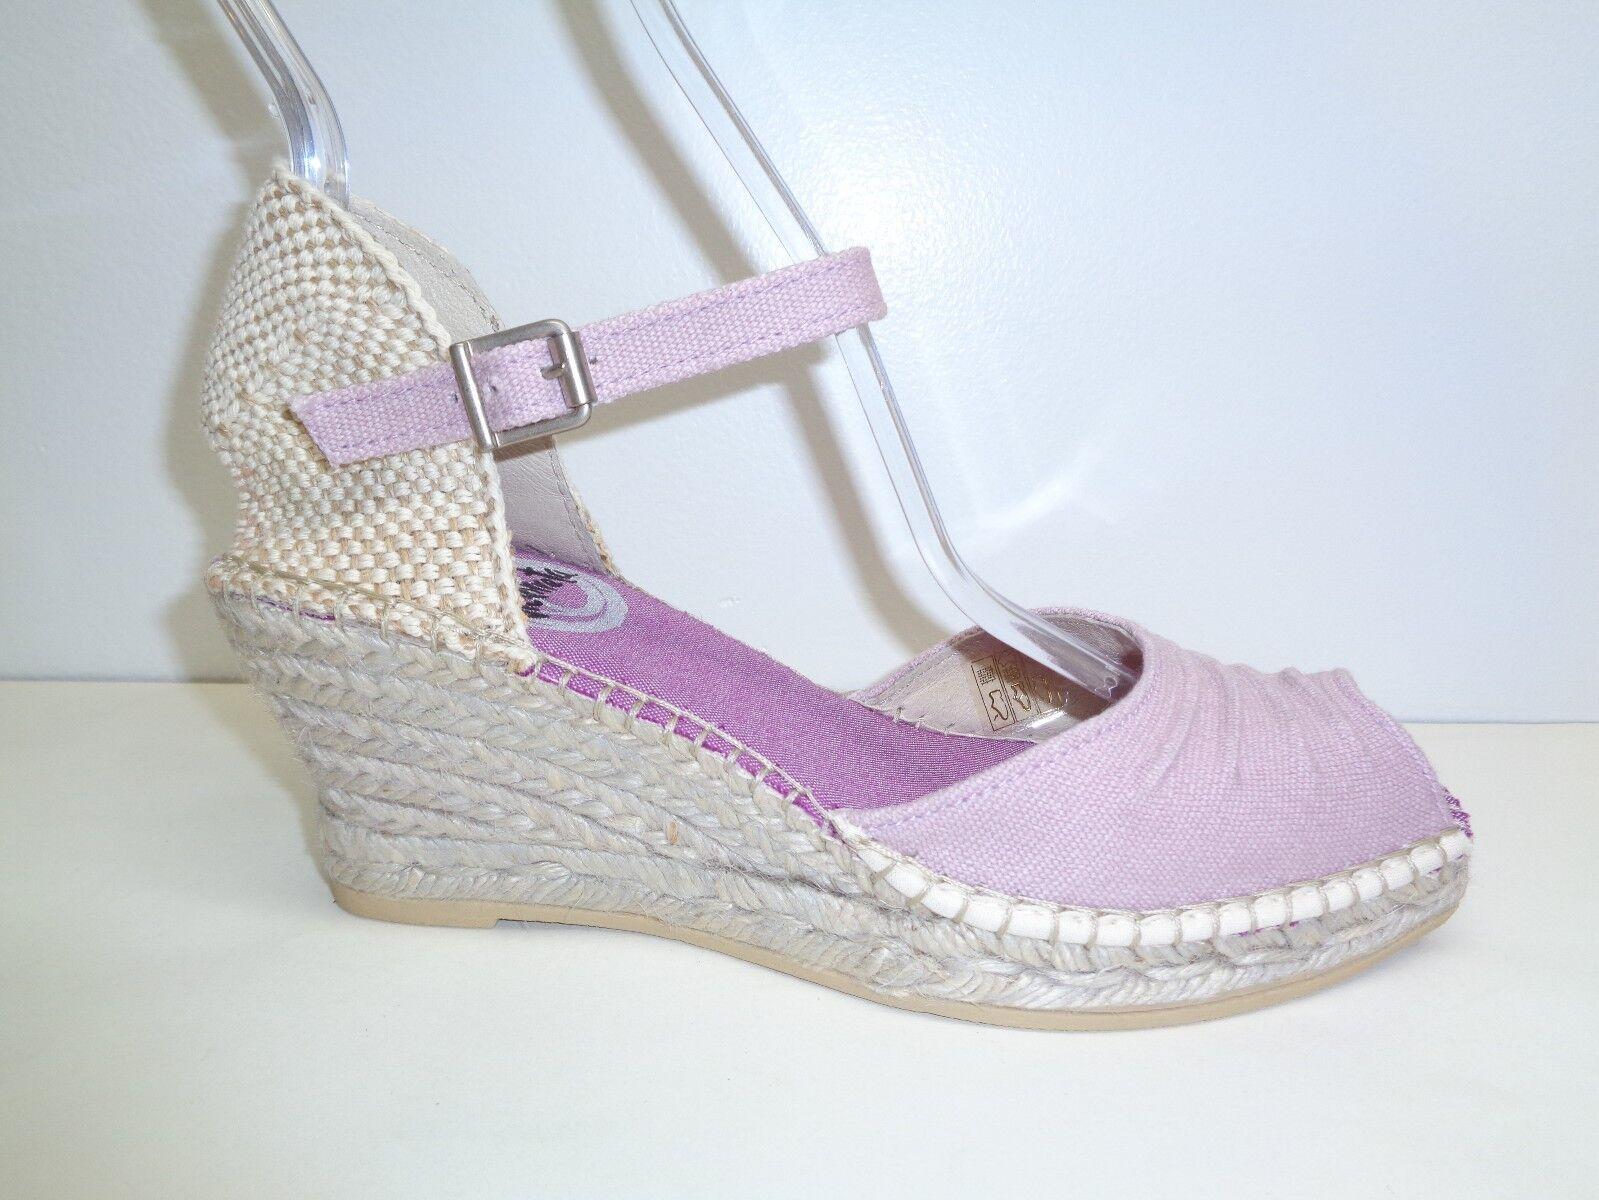 Vidorreta Größe 5.5 to 6 Eur 36 DAYNA Lilac Canvas Wedge Sandales NEU Damenschuhe Schuhes